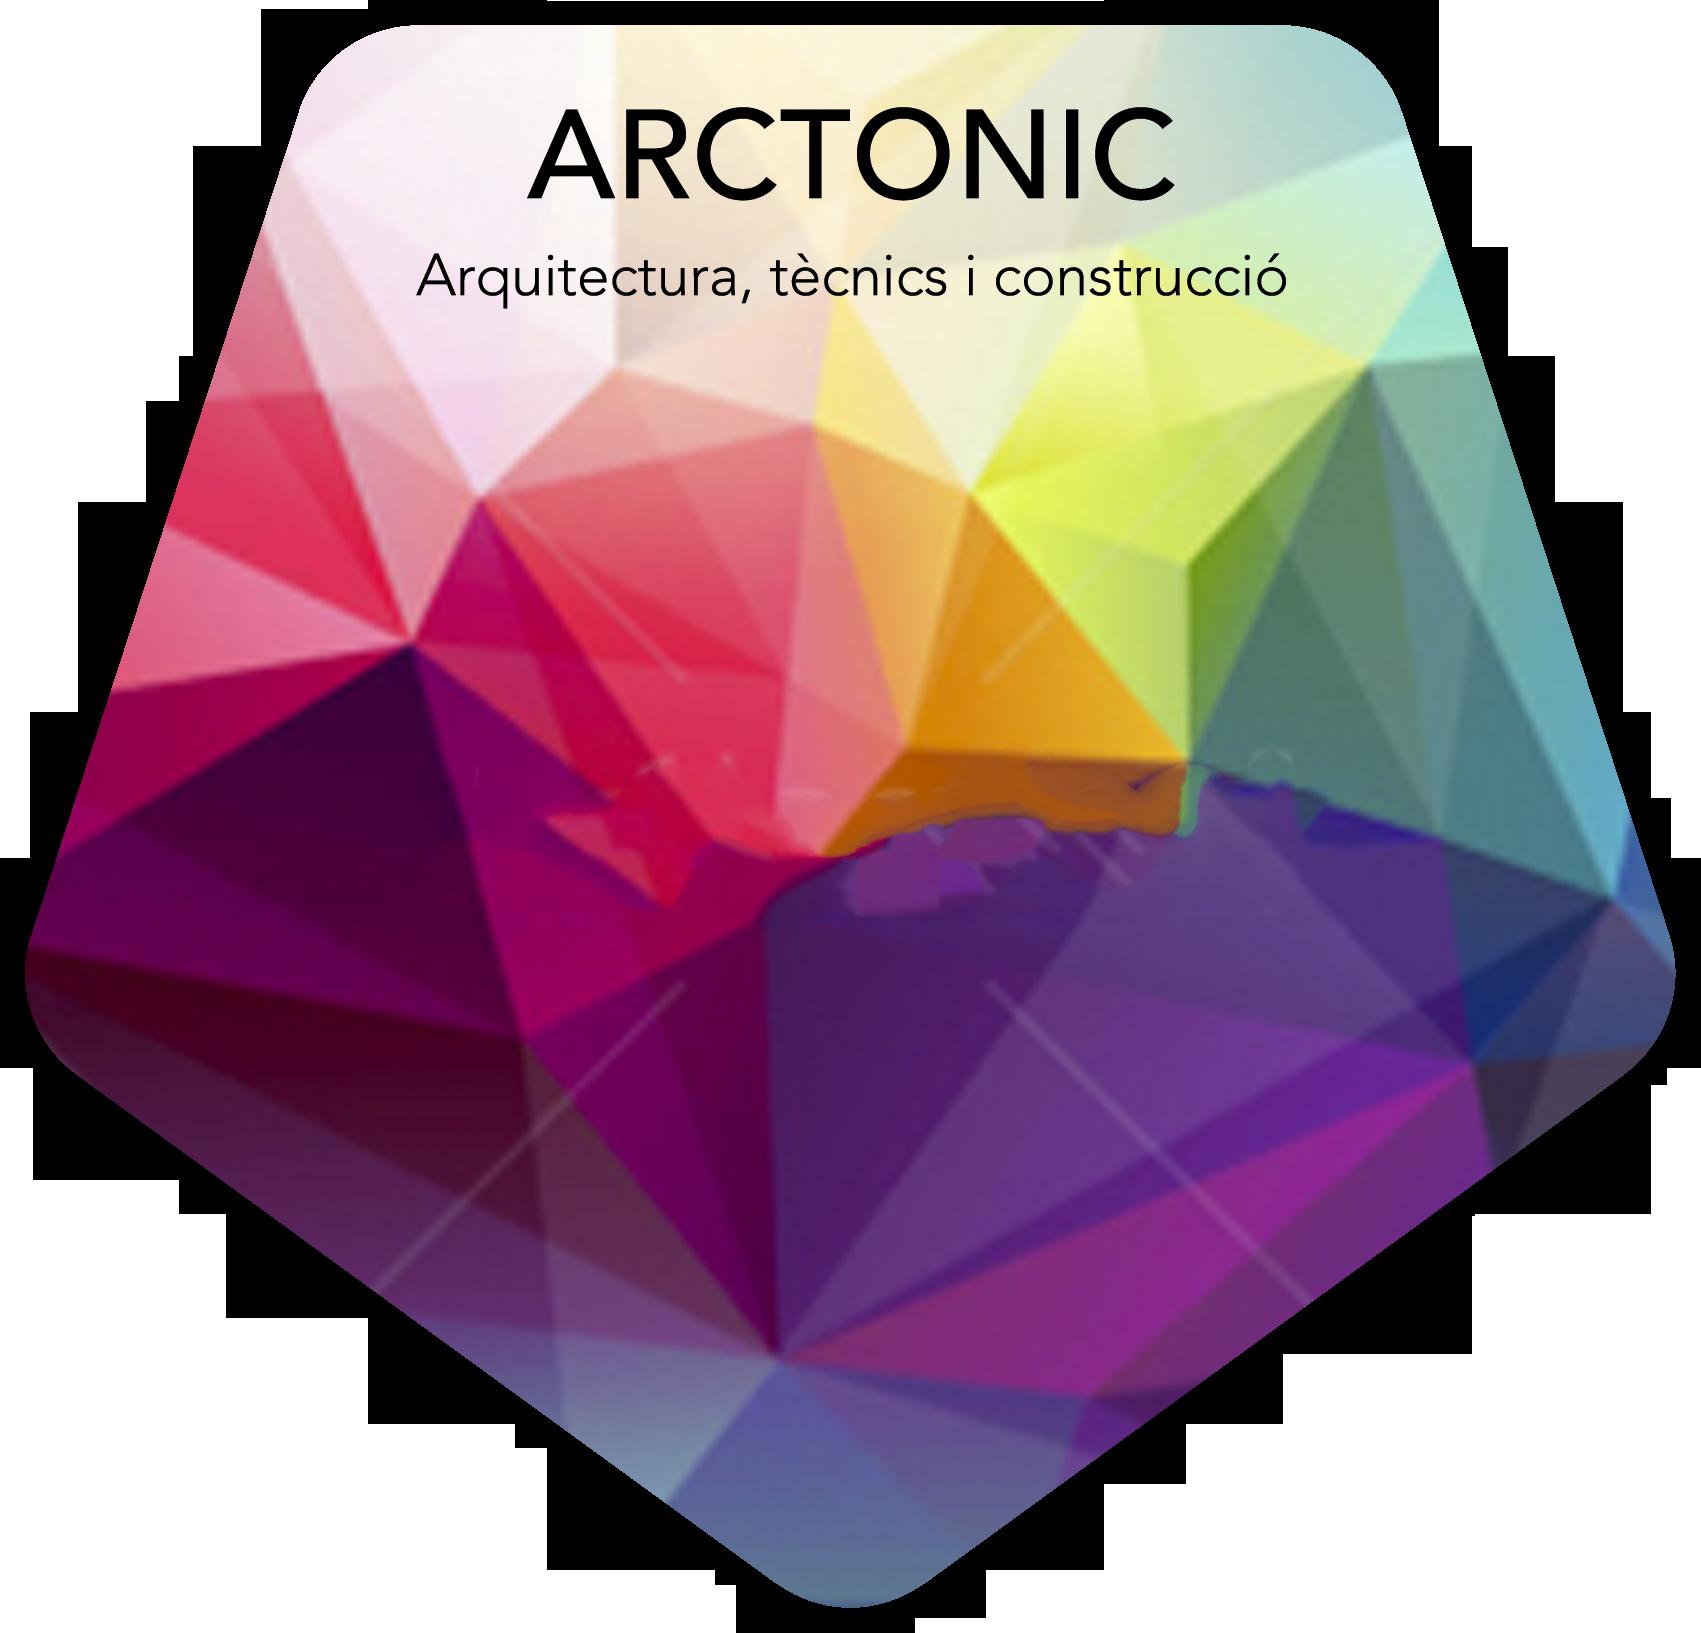 Arctonic